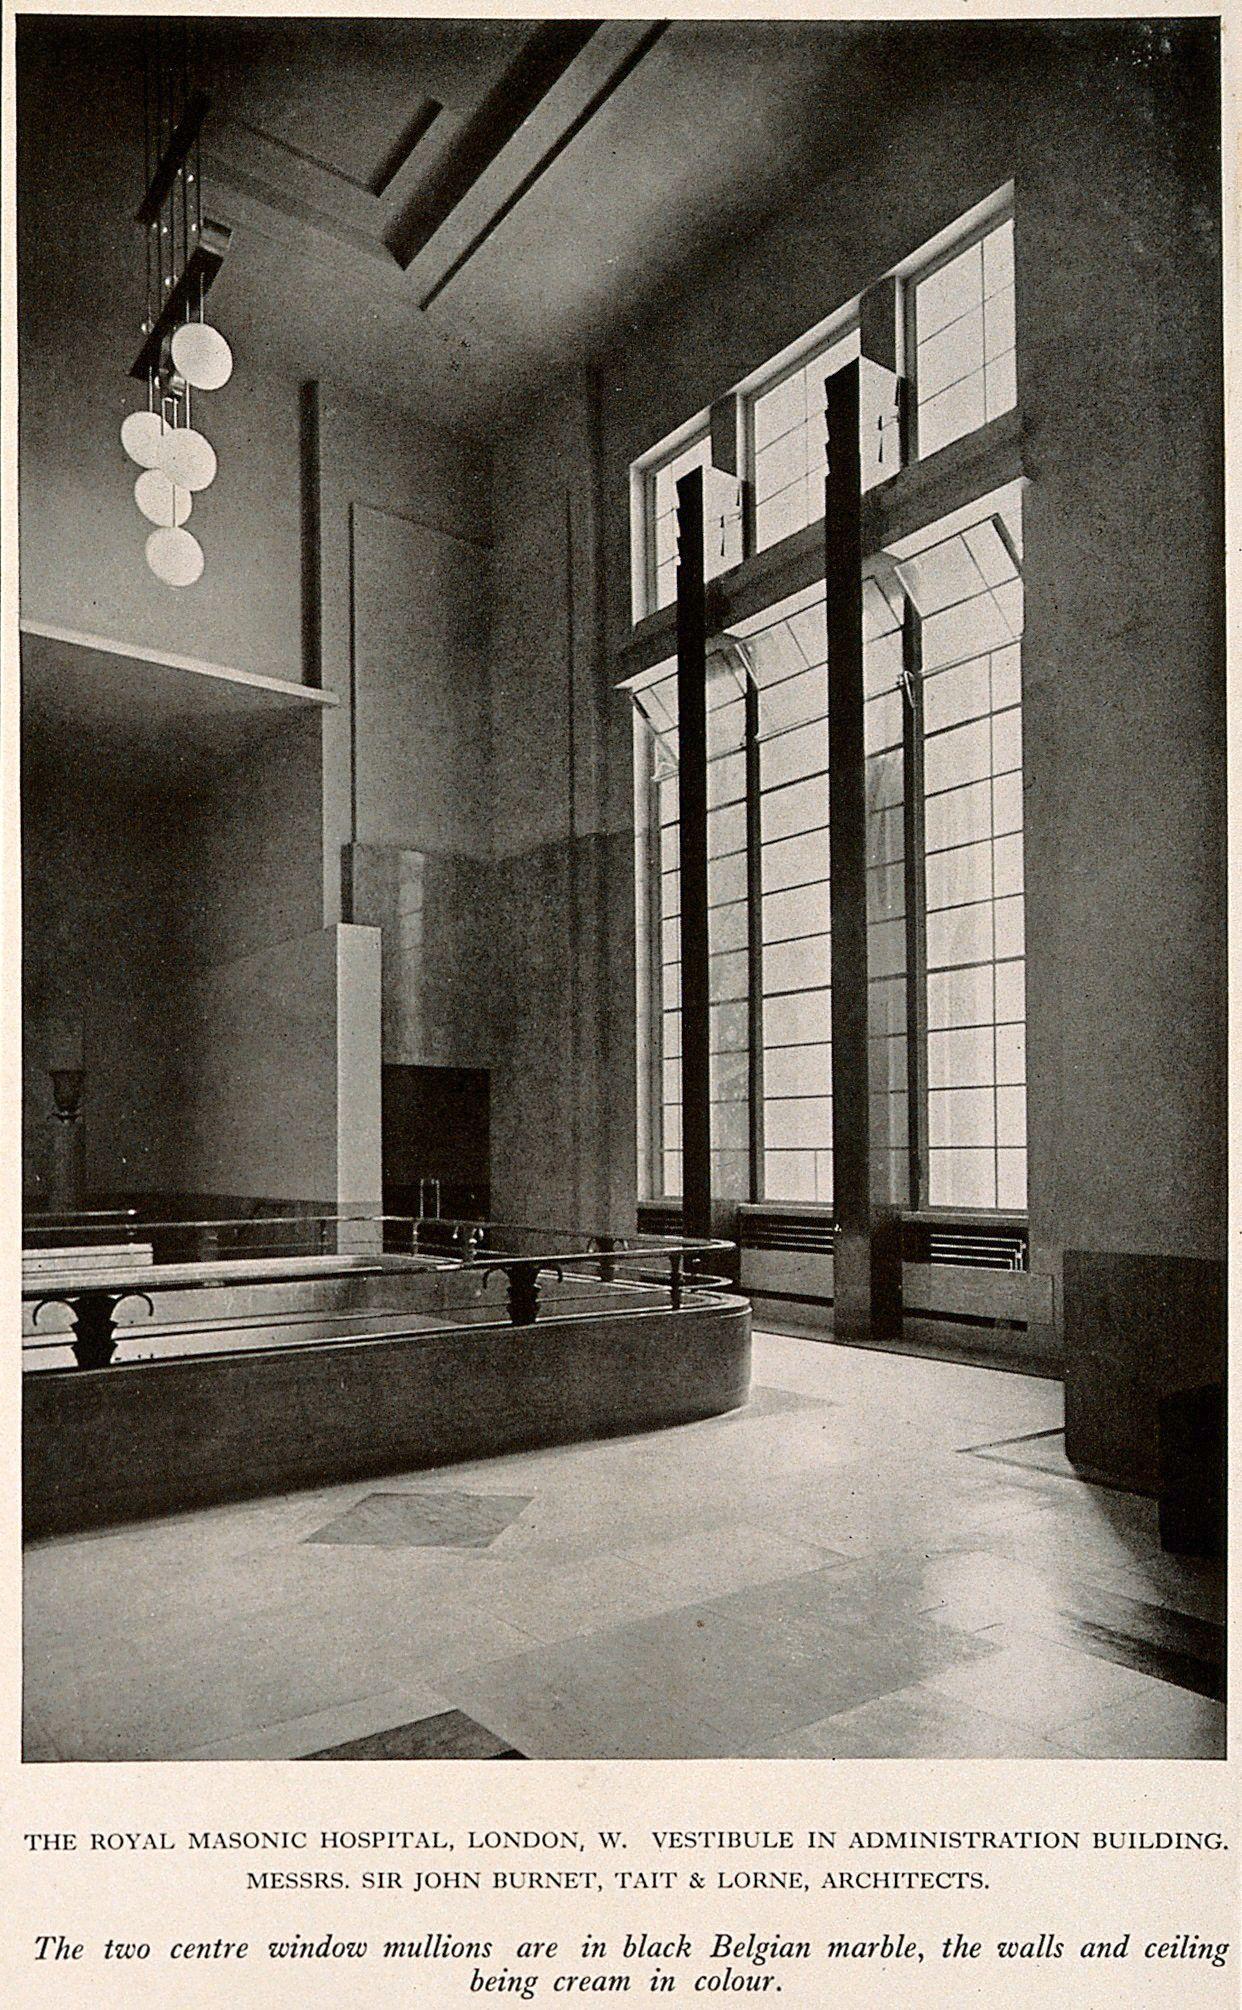 Royal Masonic Hospital, London: the main windows in the